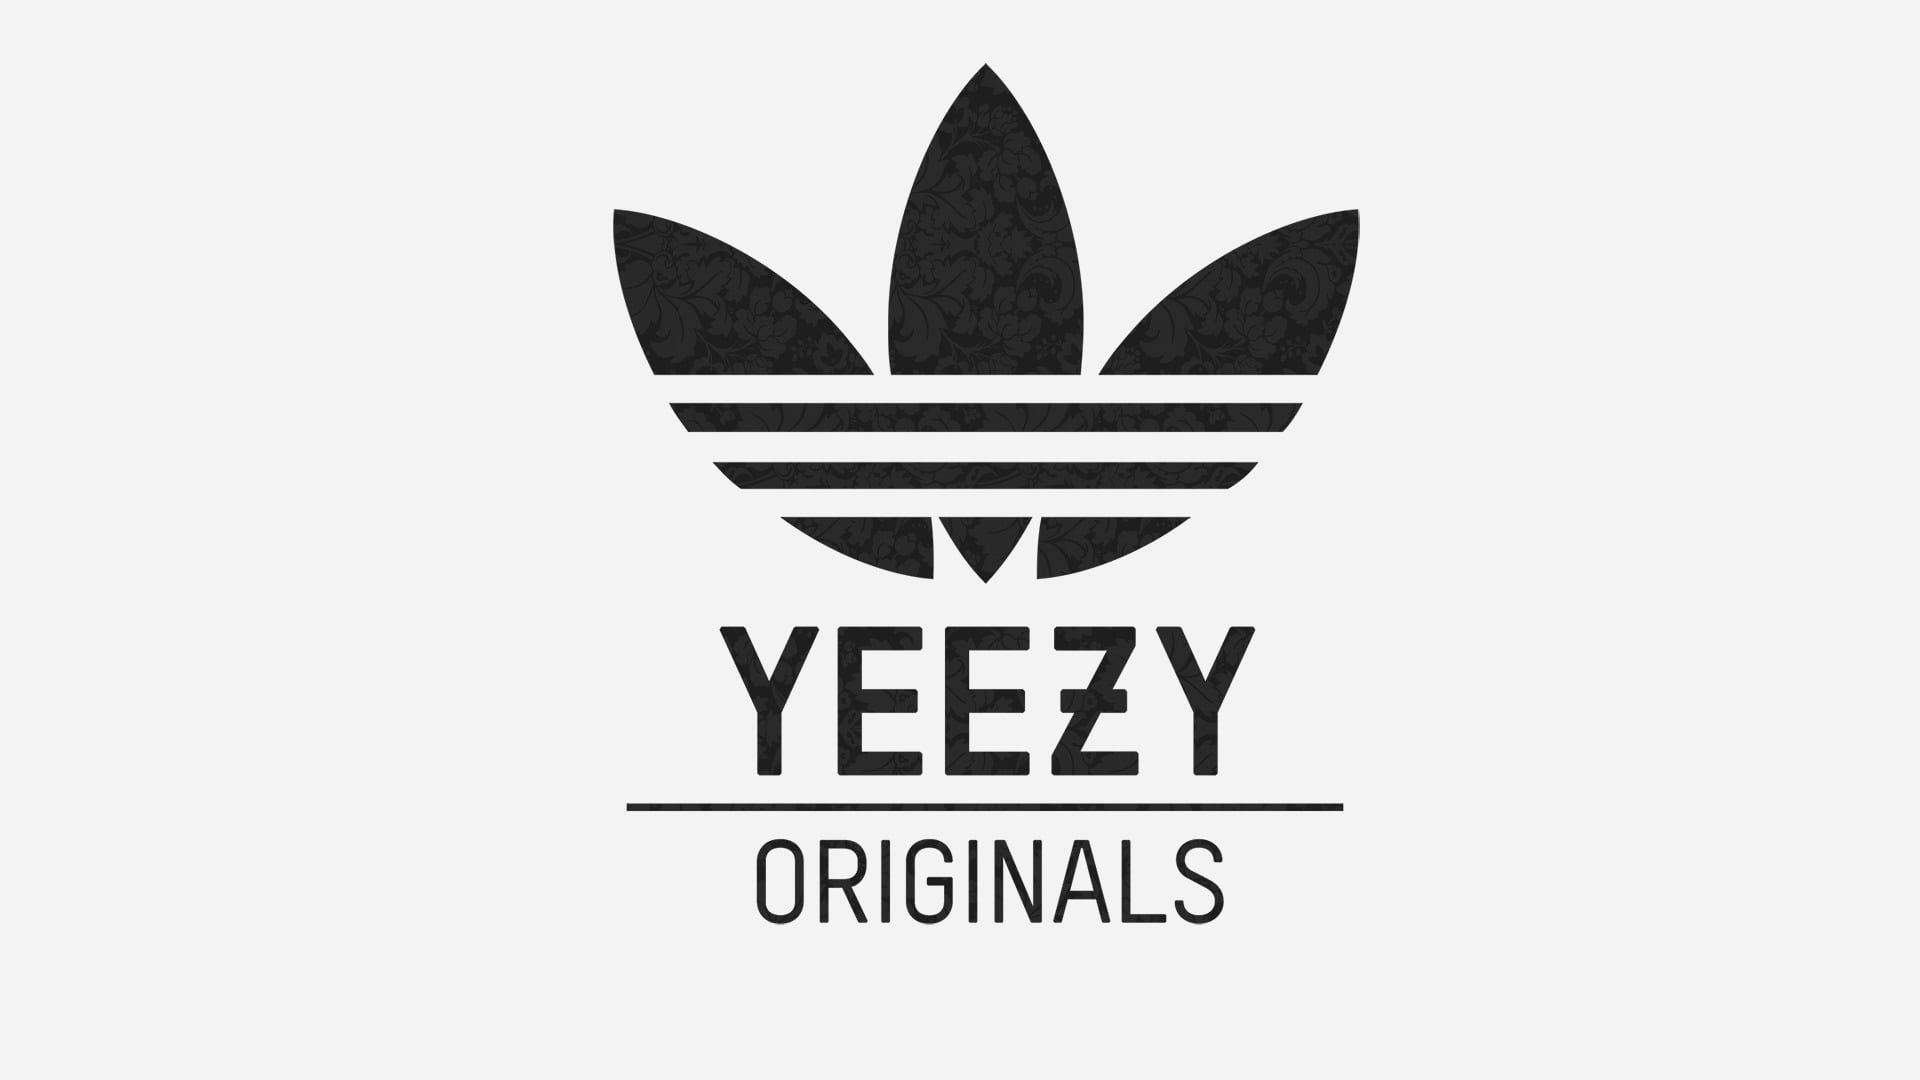 Adidas Logo Wallpaper White Background Brands Text Western Script Communication In 2020 Adidas Logo Wallpapers Sneakers Wallpaper Adidas Logo